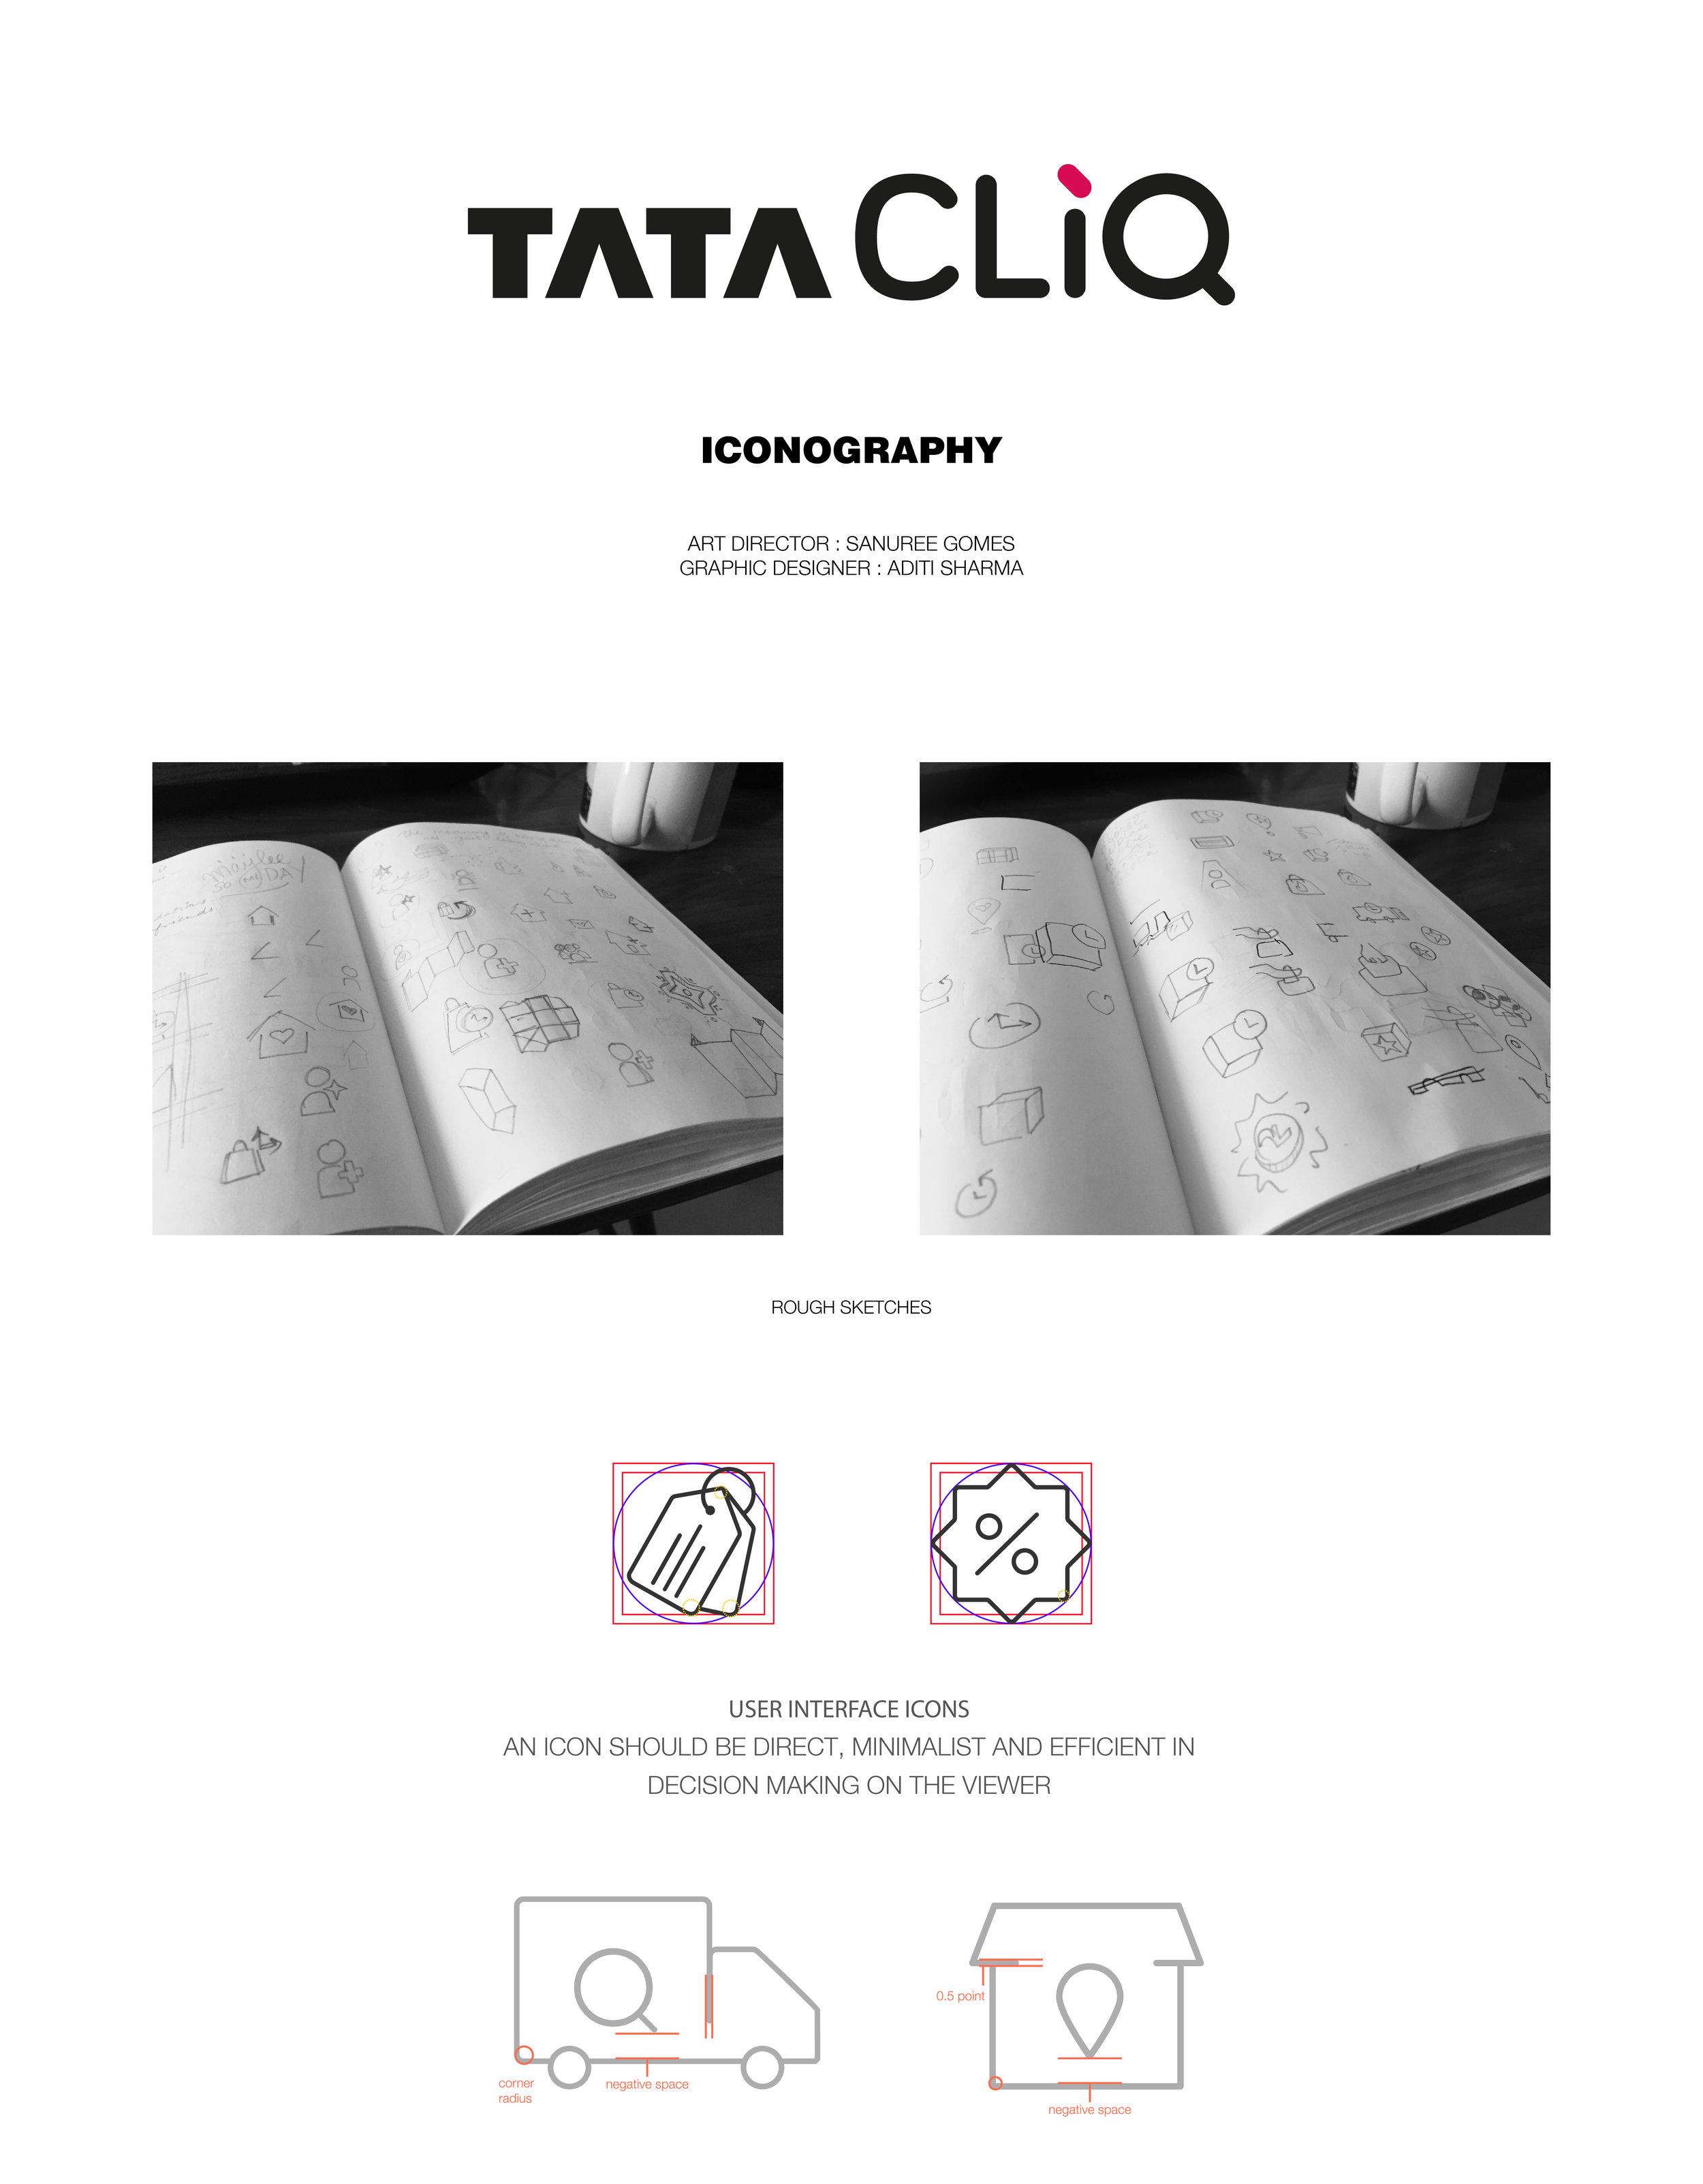 Final-Iconography-TataCliQ-01.jpg